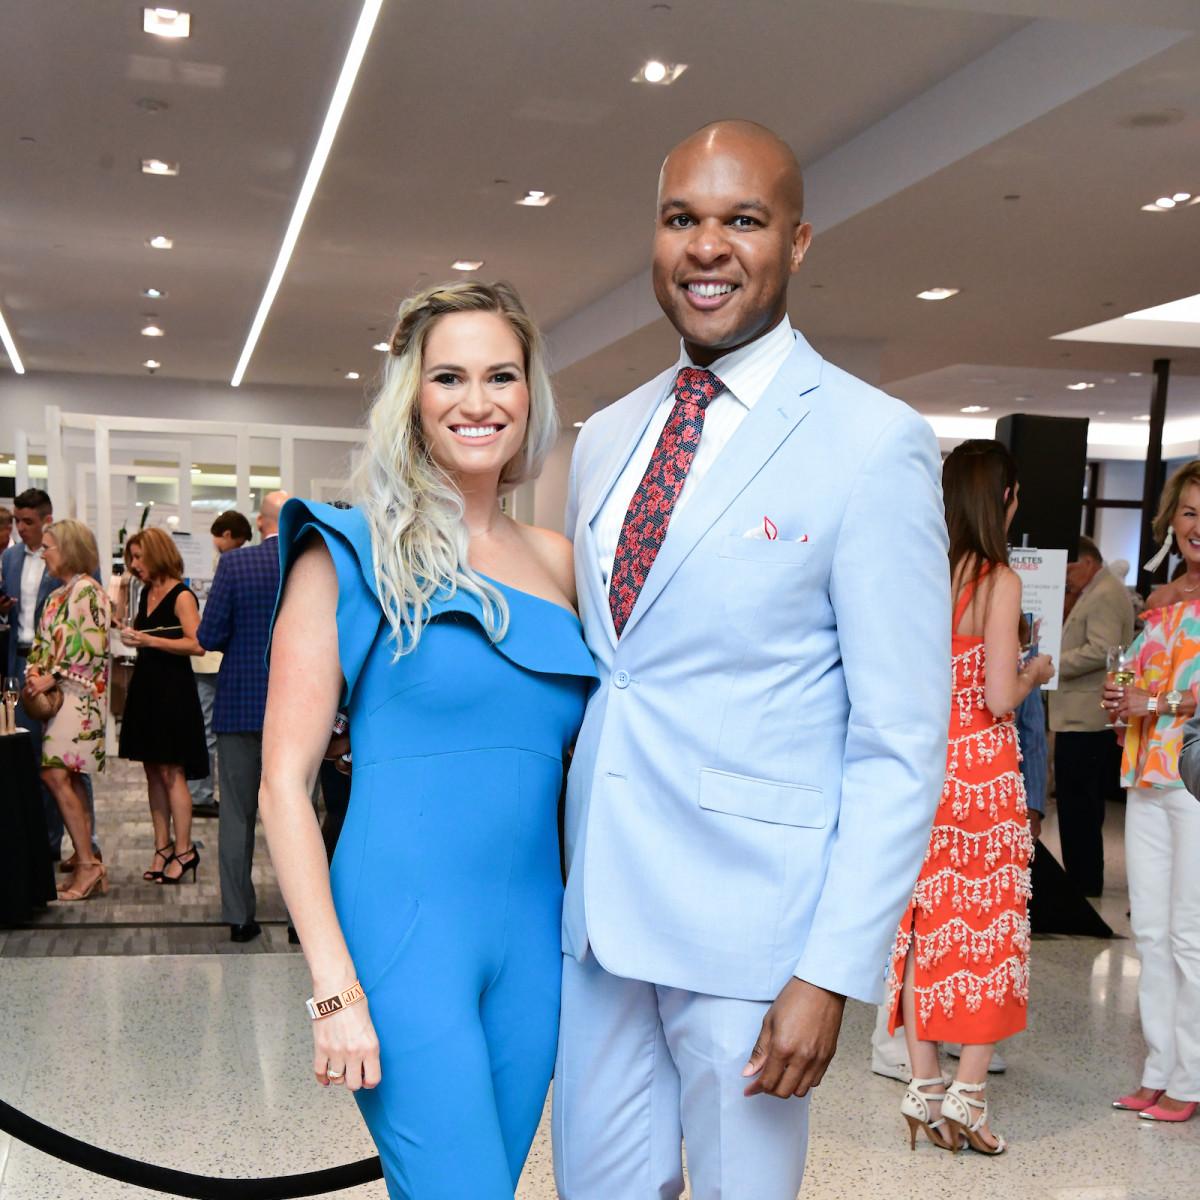 Houston Astros Team Up 4 Kids and K9s 2019 Lauren Varnado and Travis Torrence